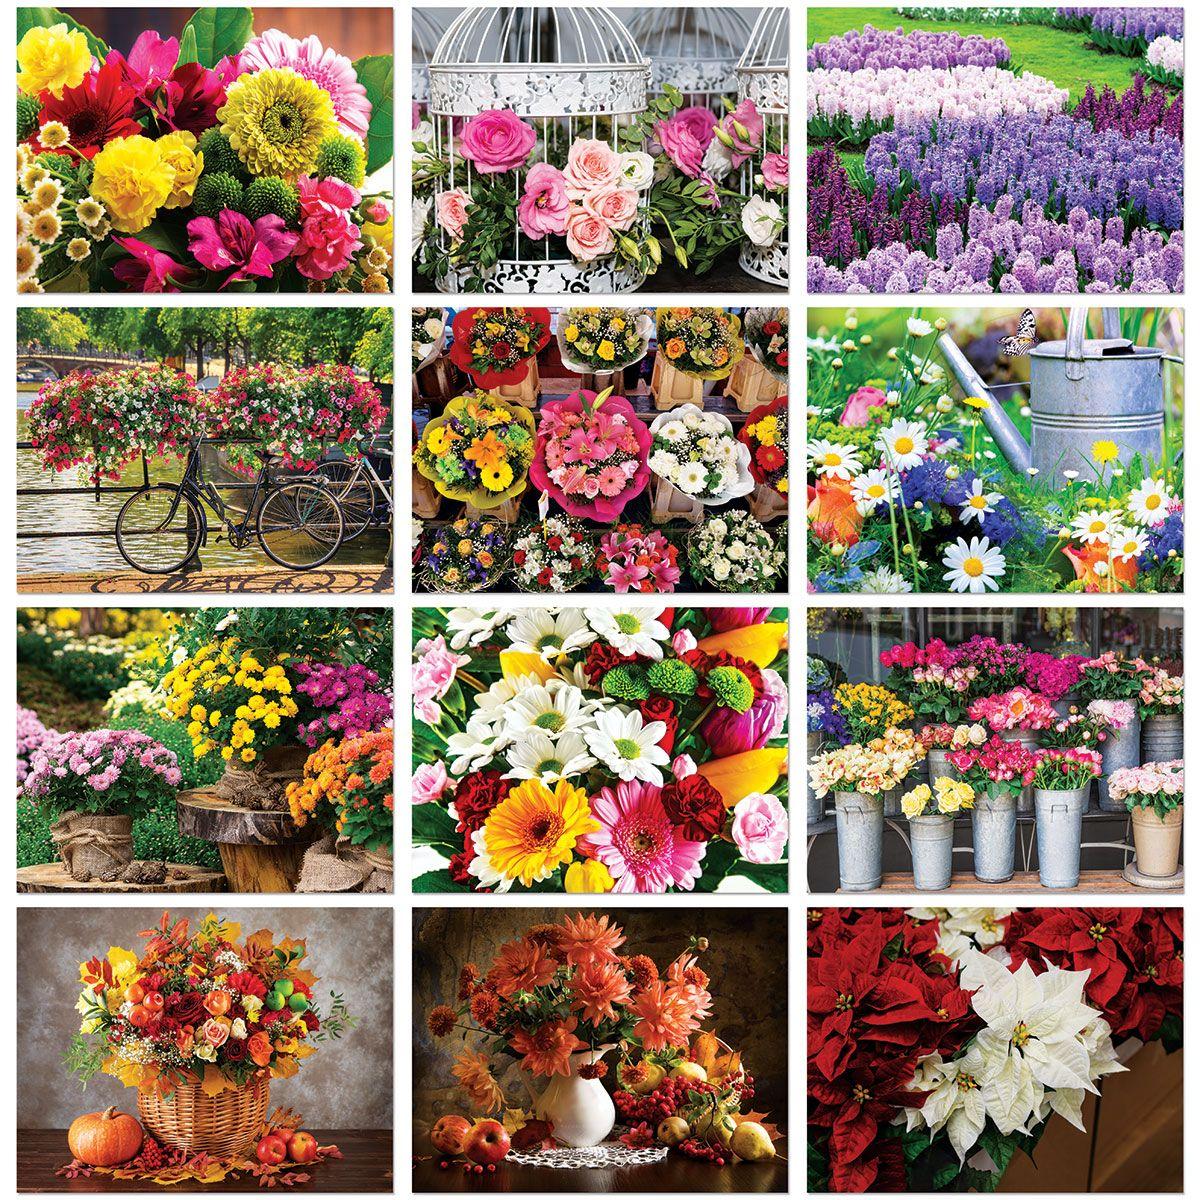 2021 A Year of Flowers Wall Calendar